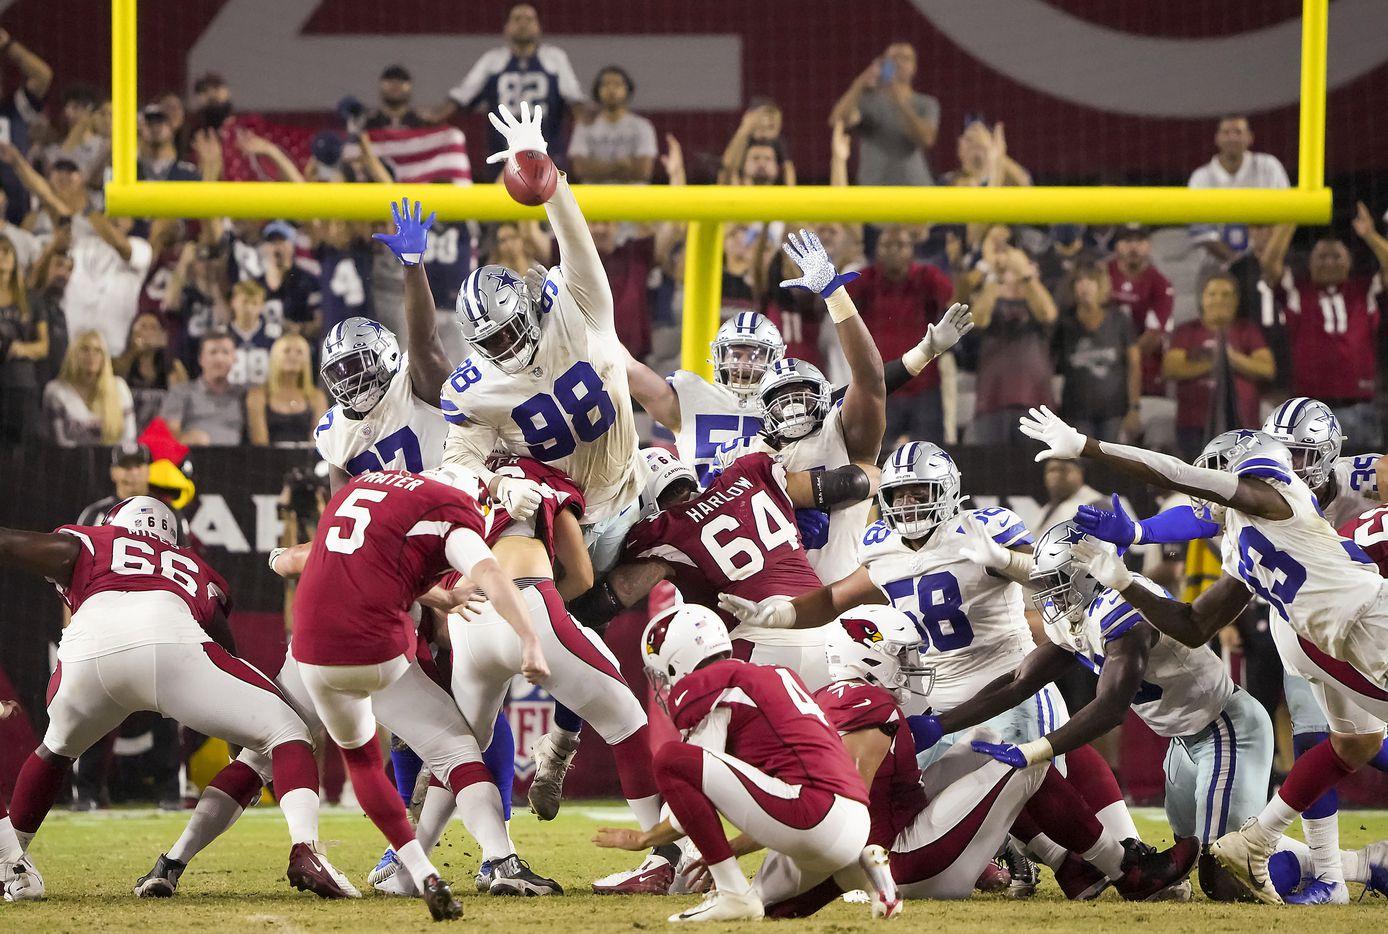 Arizona Cardinals kicker Matt Prater (5) kicks a game-winning 57-yard field goal over Dallas Cowboys defensive tackle Quinton Bohanna (98) on the final play of a preseason NFL football game at State Farm Stadium on Friday, Aug. 13, 2021, in Glendale, Ariz.